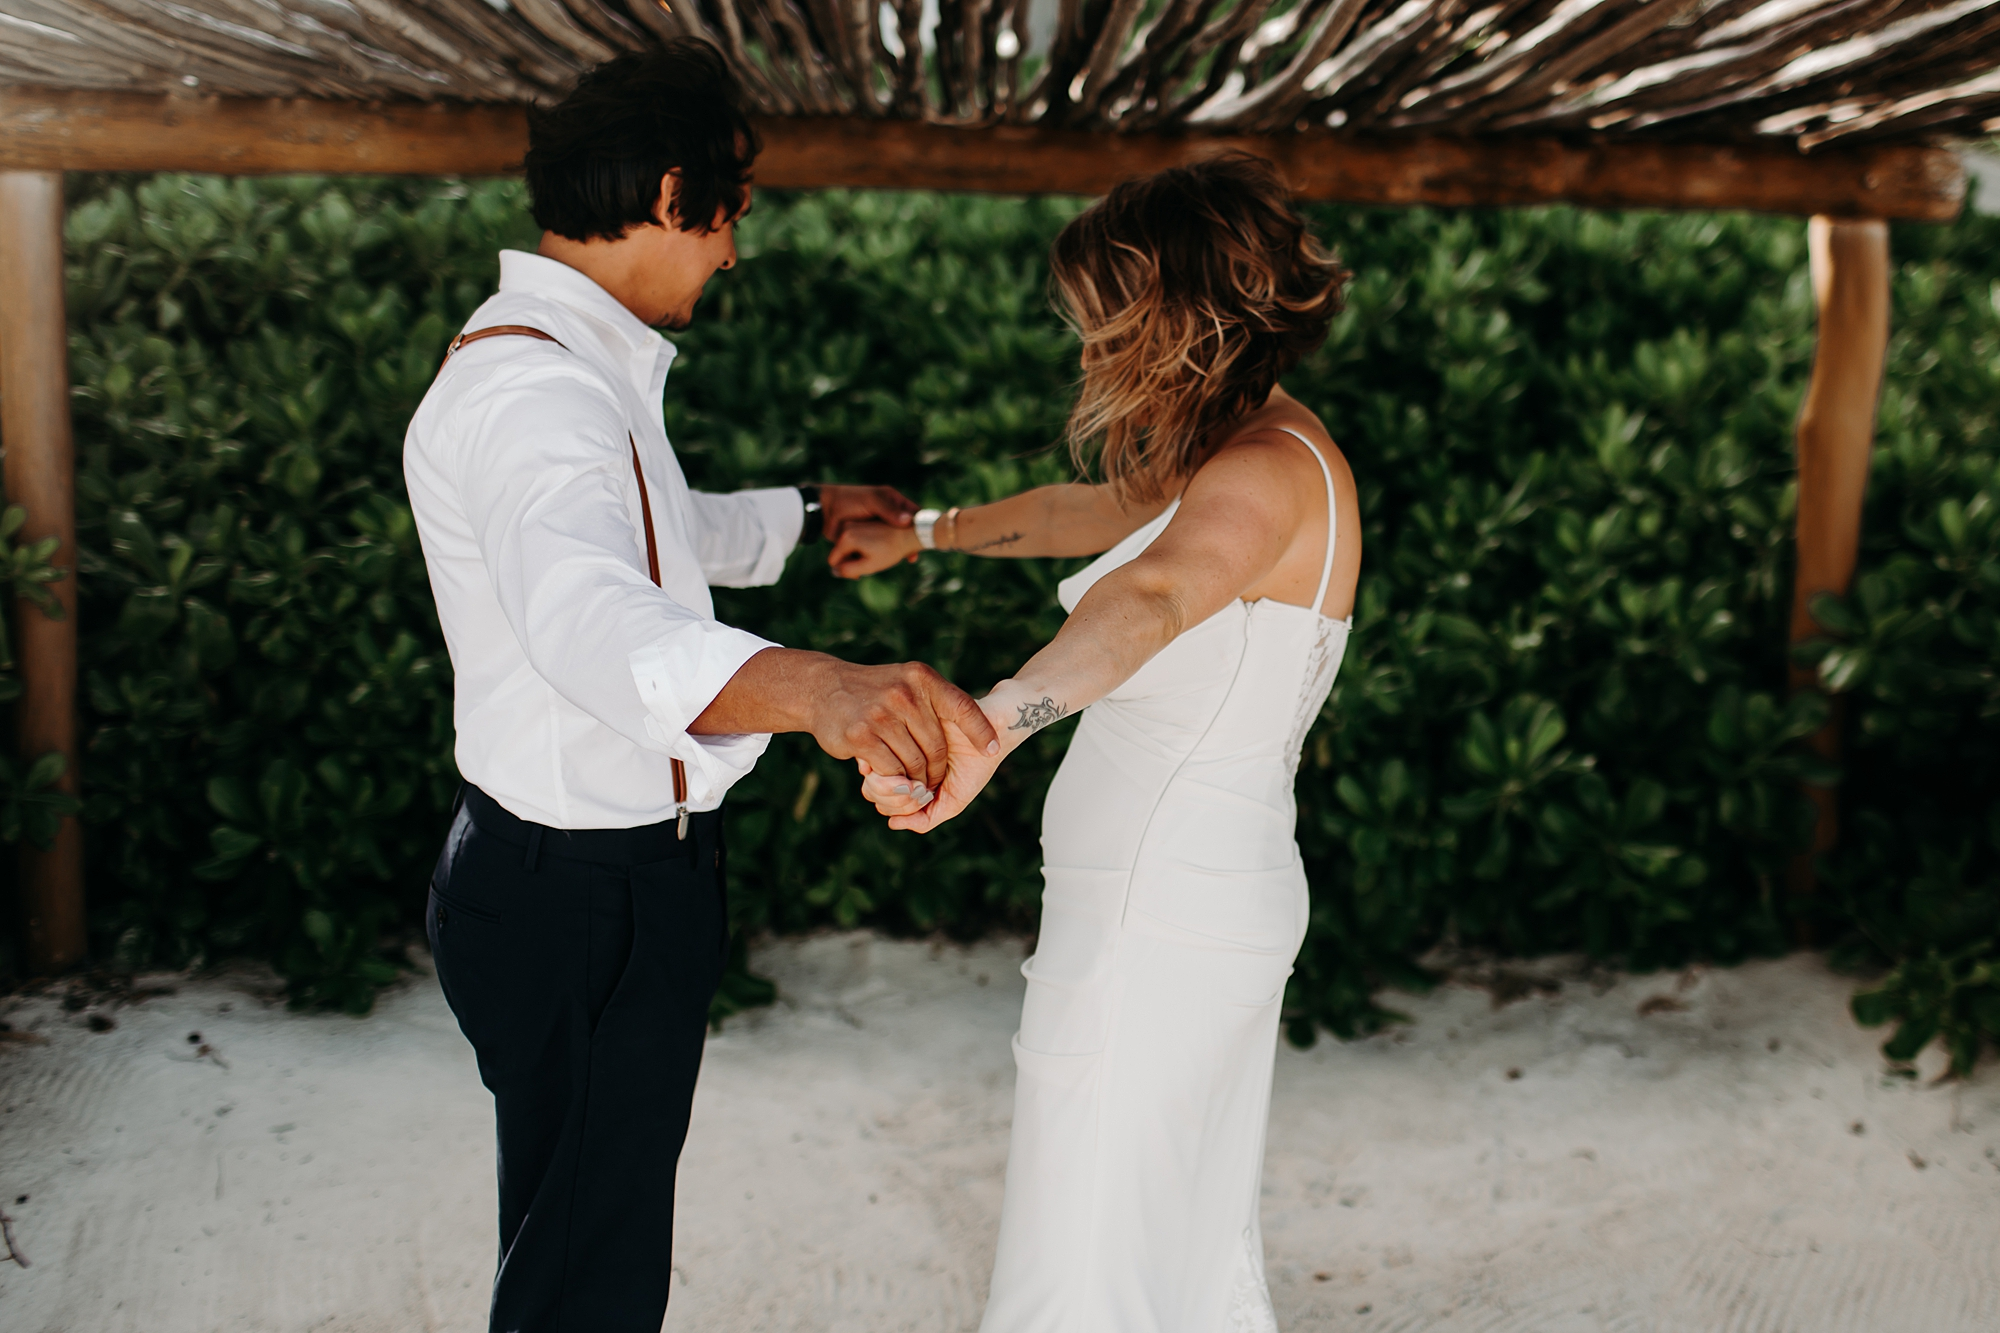 Danielle-San-Antonio-Wedding-Photographer-65_WEB.jpg